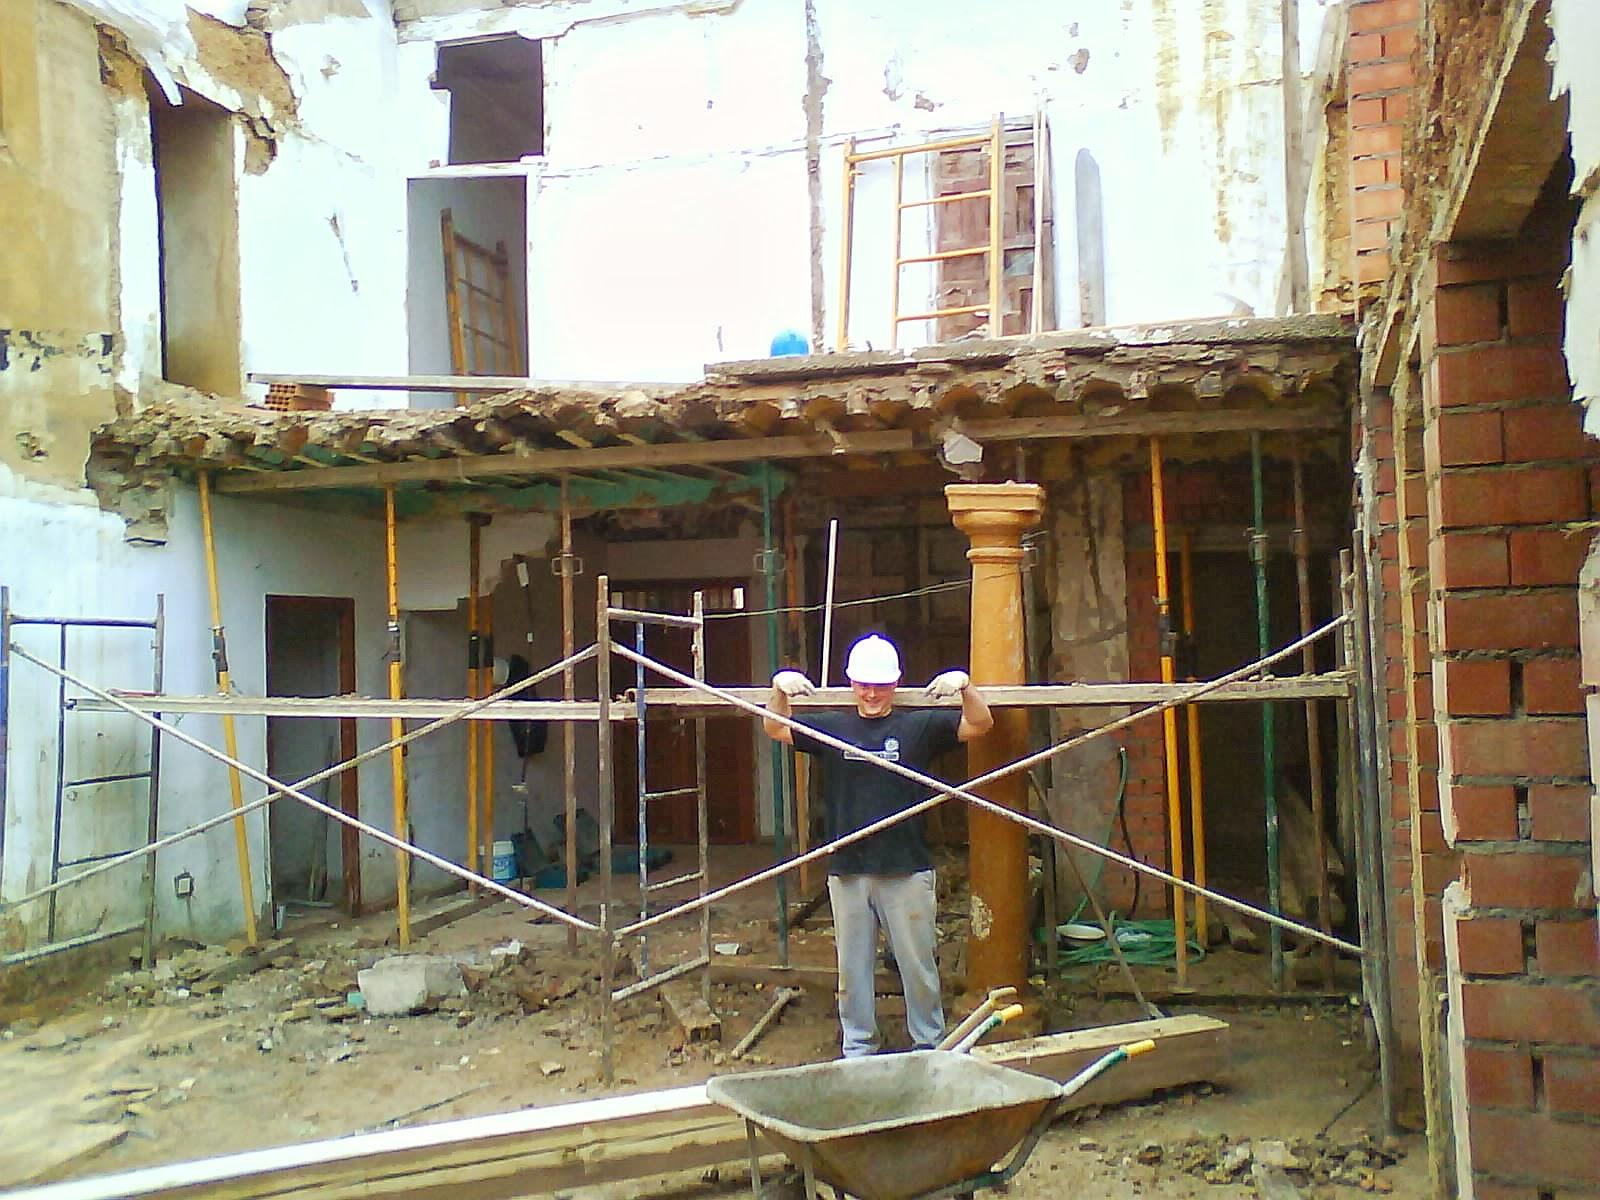 Carpinteria sevilla rehabilitaci n y restauraci n - Rehabilitacion de casas antiguas ...